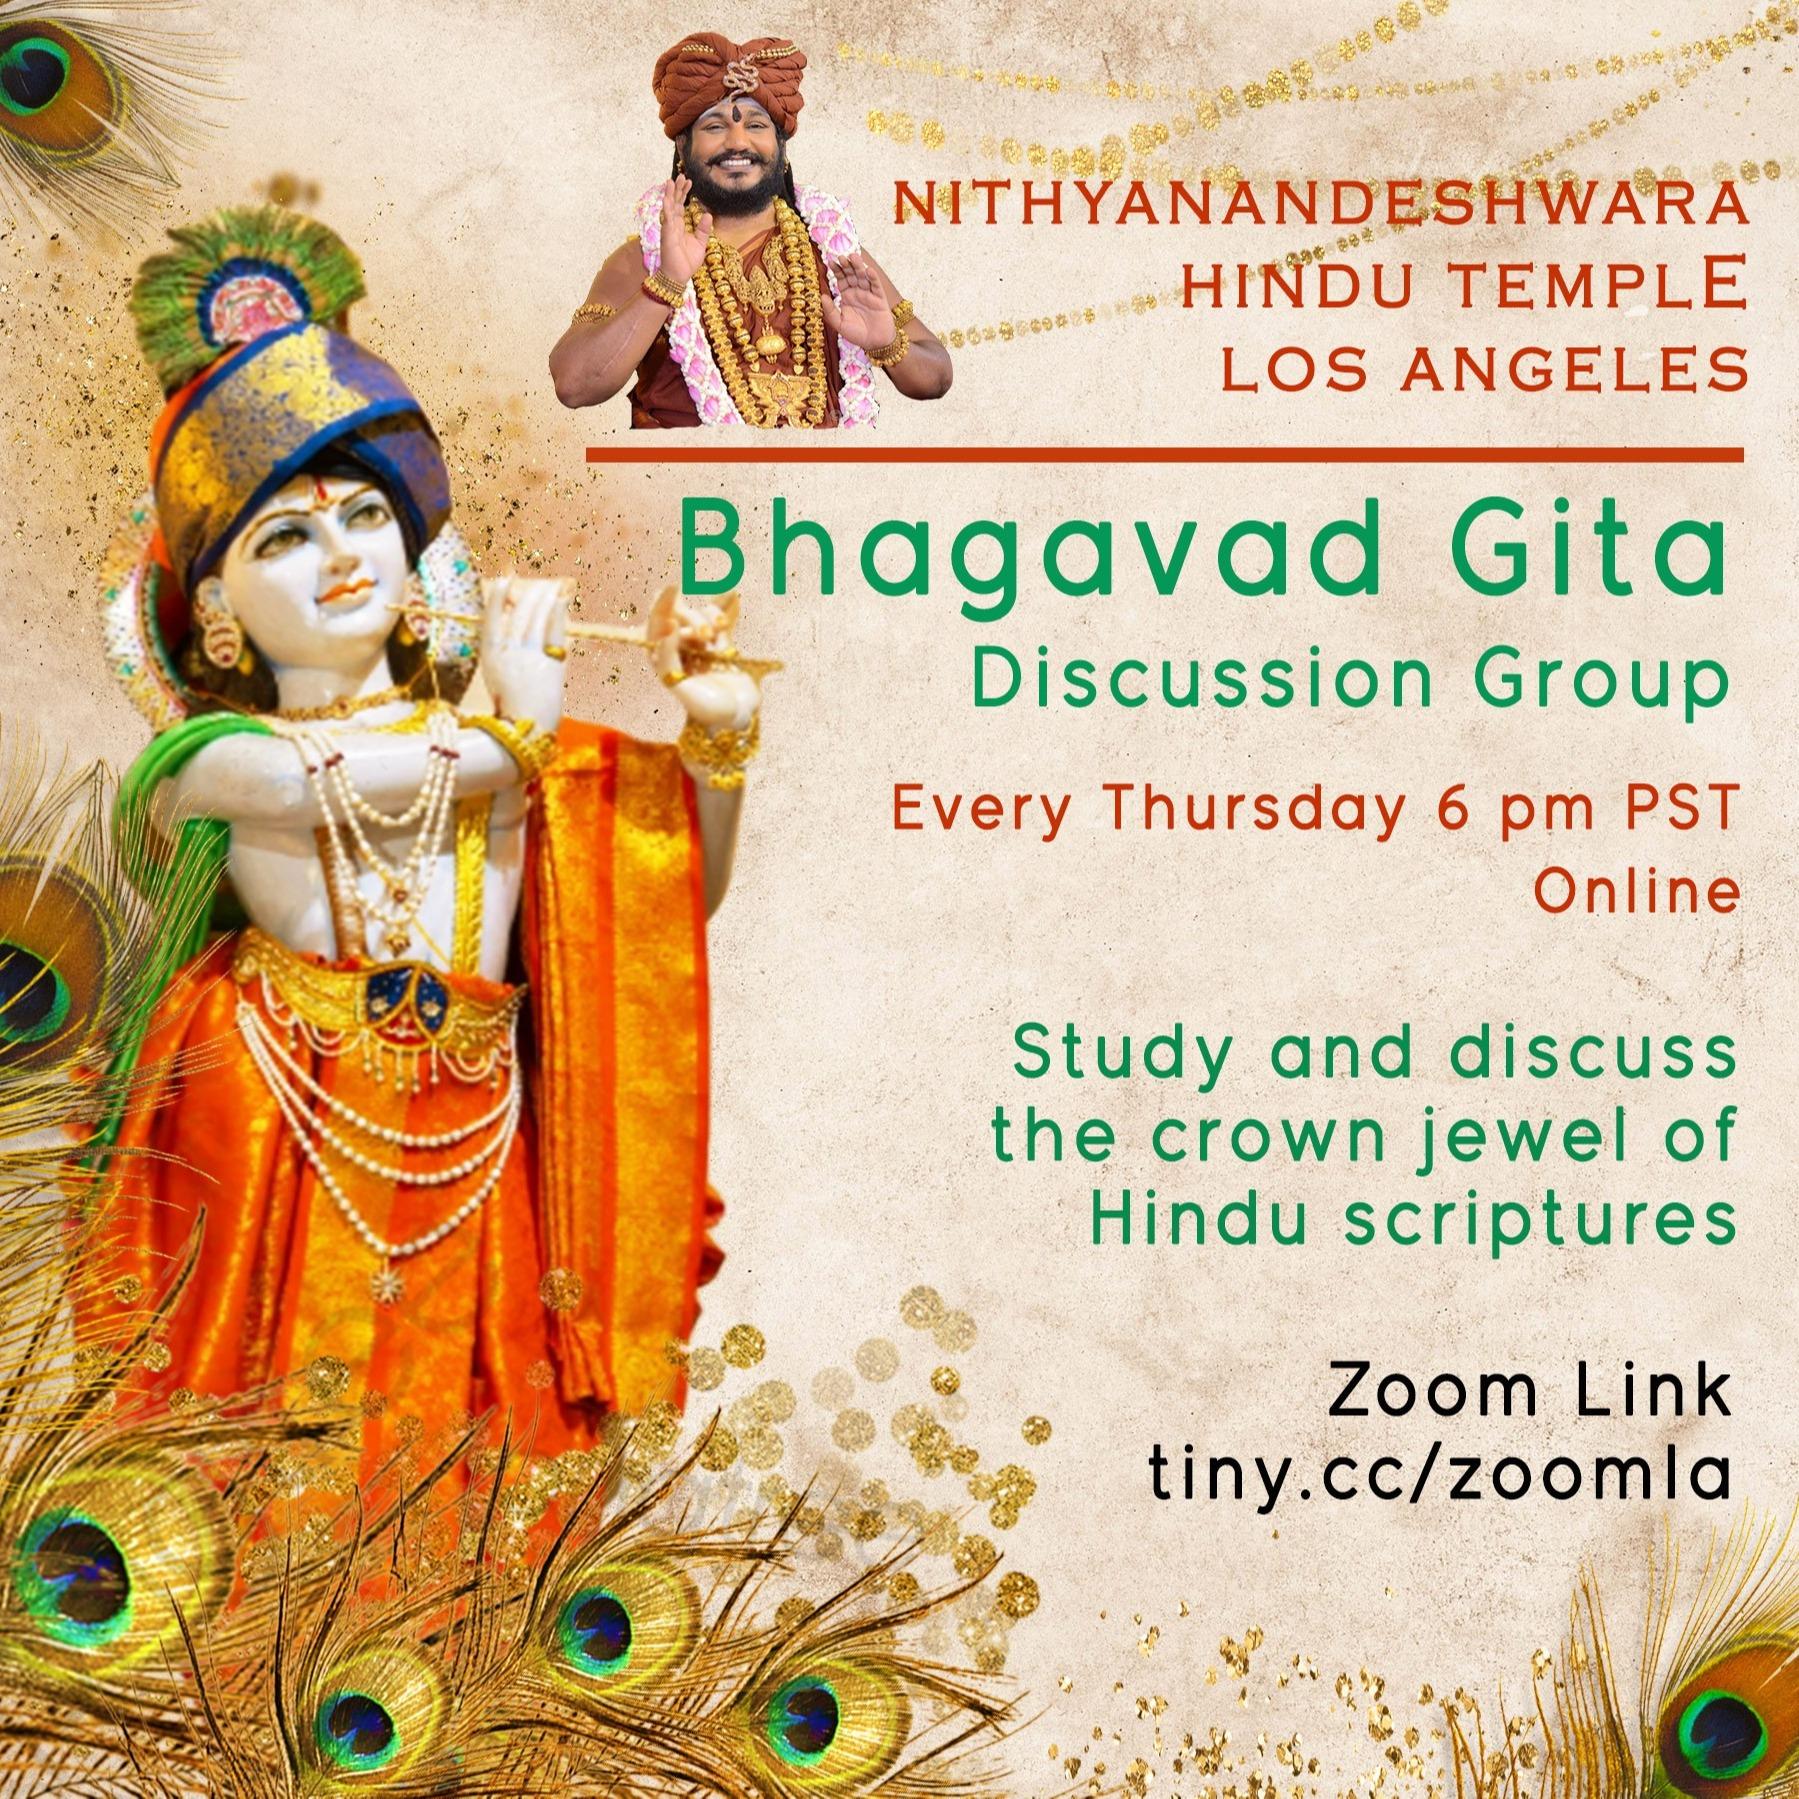 Bhagavad Gita Class: Thursdays 6 pm PST